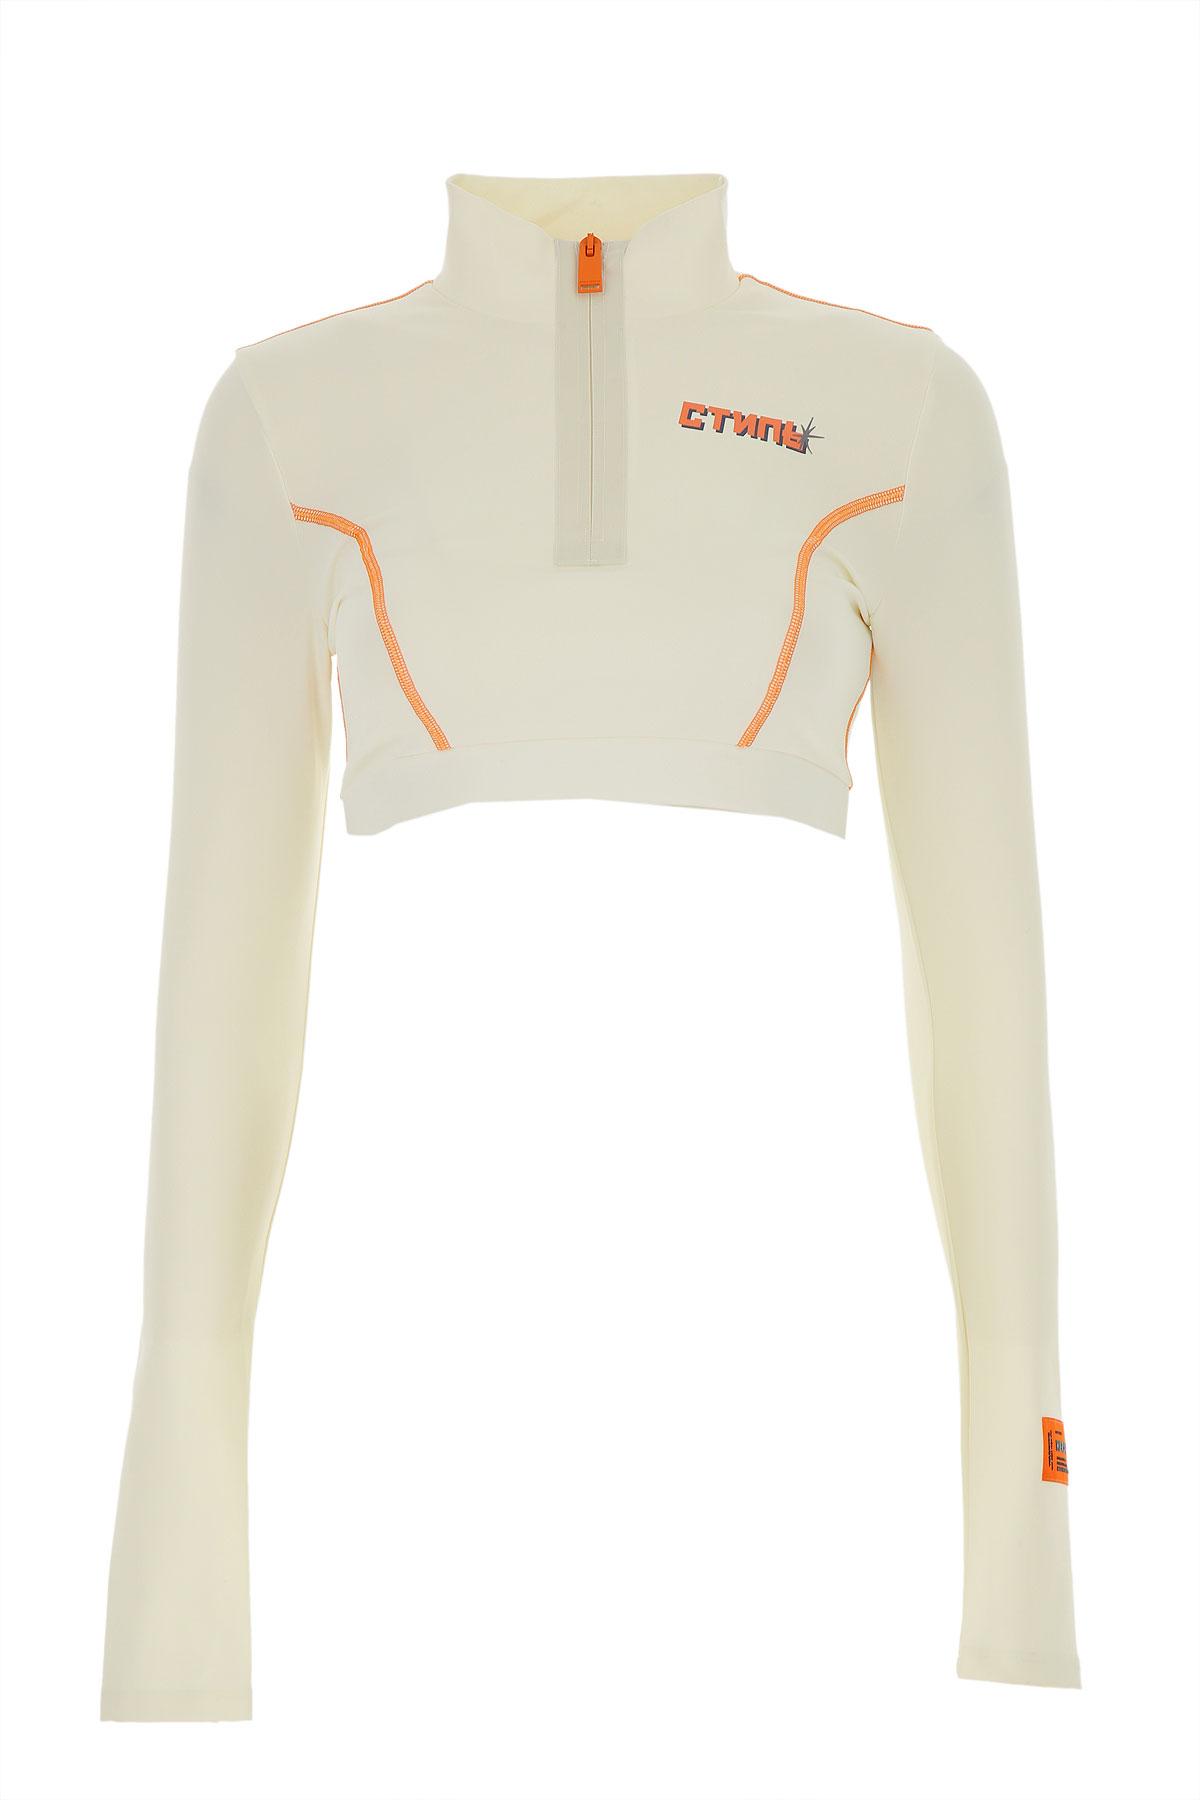 Heron Preston Sweatshirt for Women On Sale, White, polyamide, 2019, 2 4 6